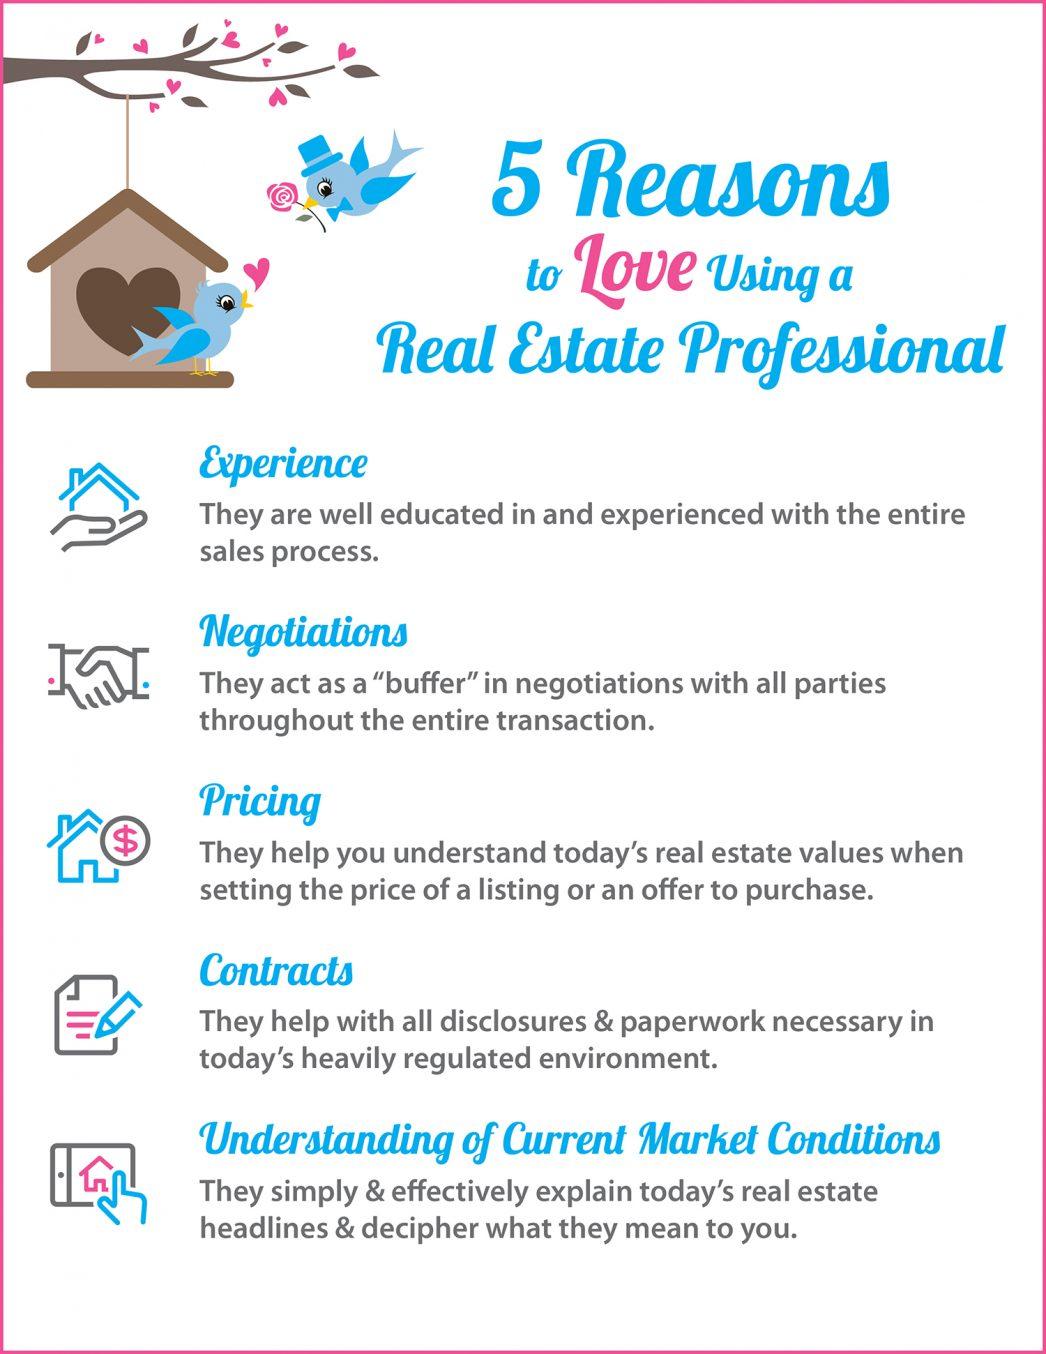 5 Reasons to Love Hiring A Real Estate Pro.jpg